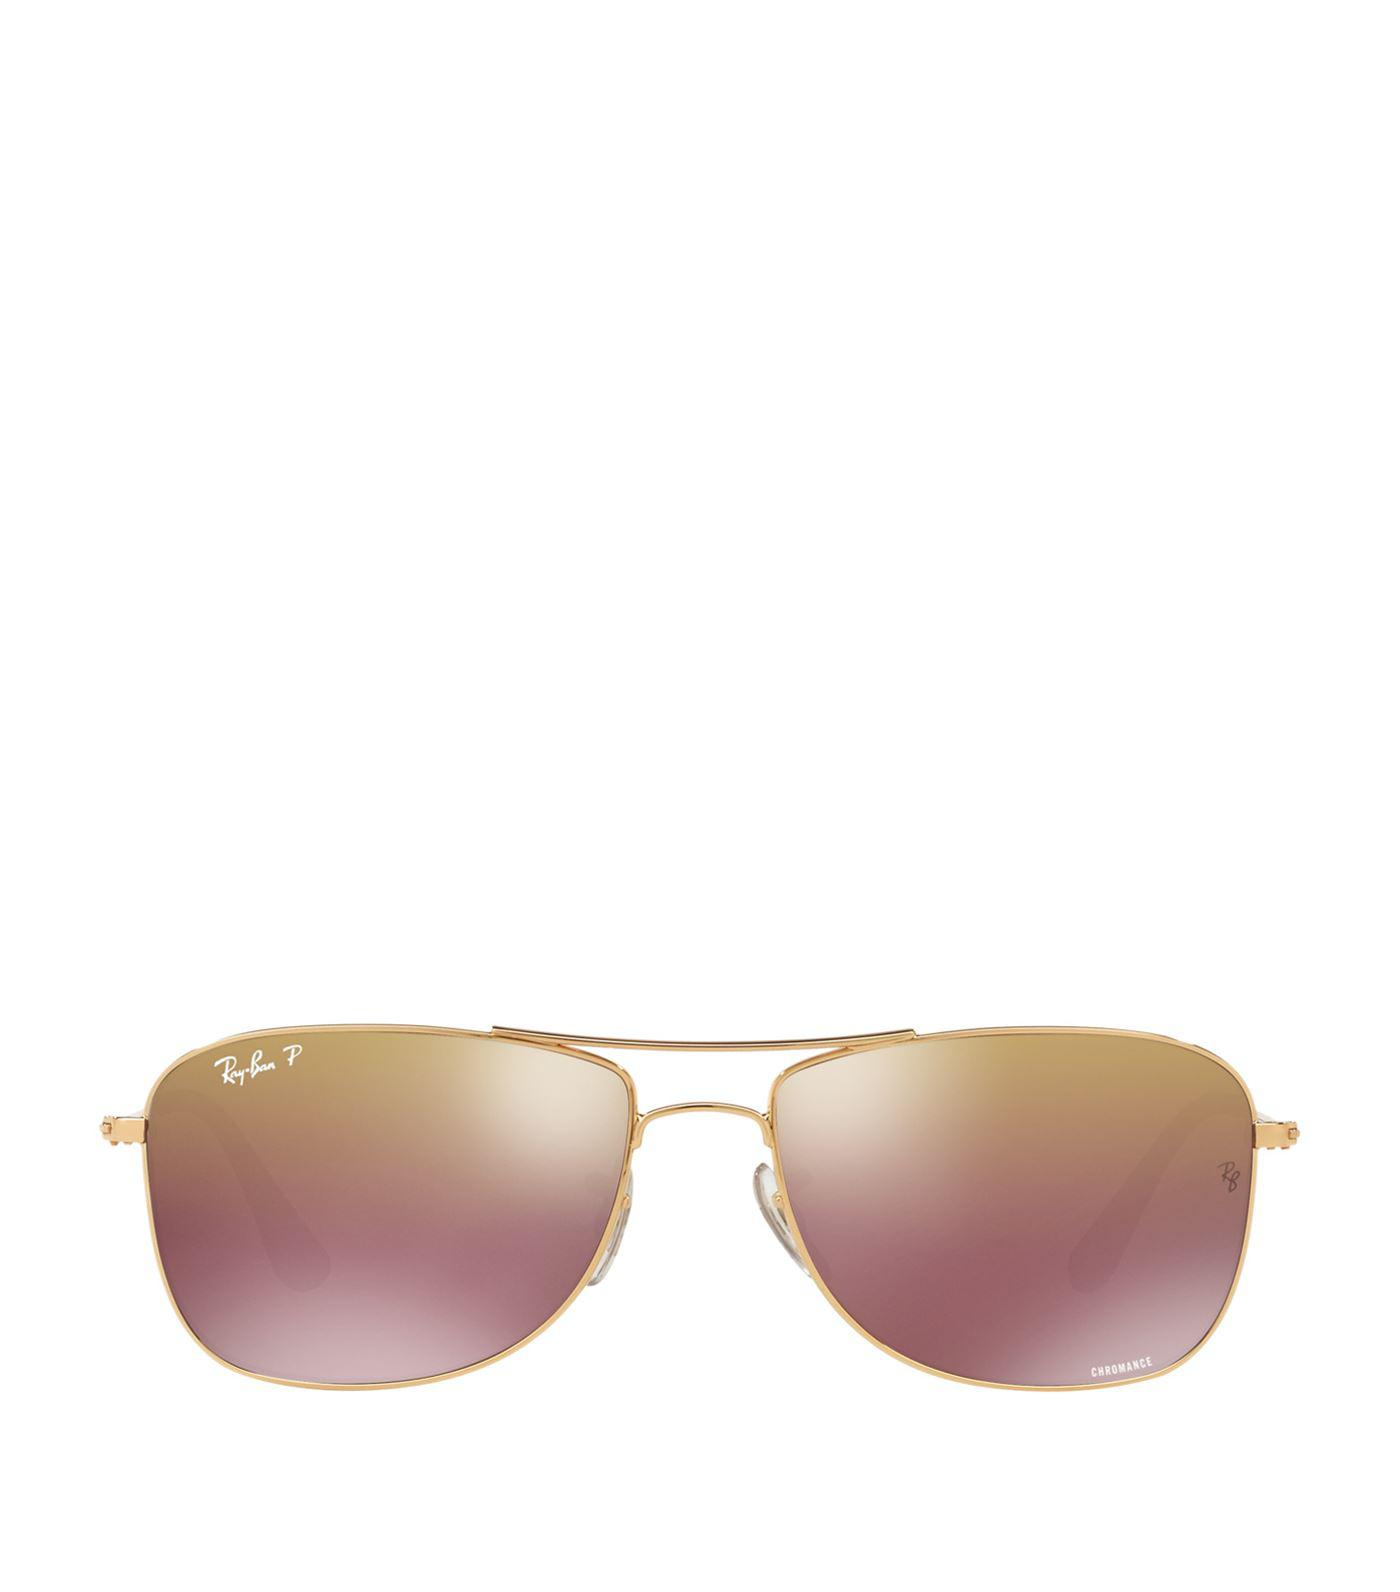 c1726fe9a1 Ray-Ban Chromance Sunglasses in Metallic for Men - Lyst